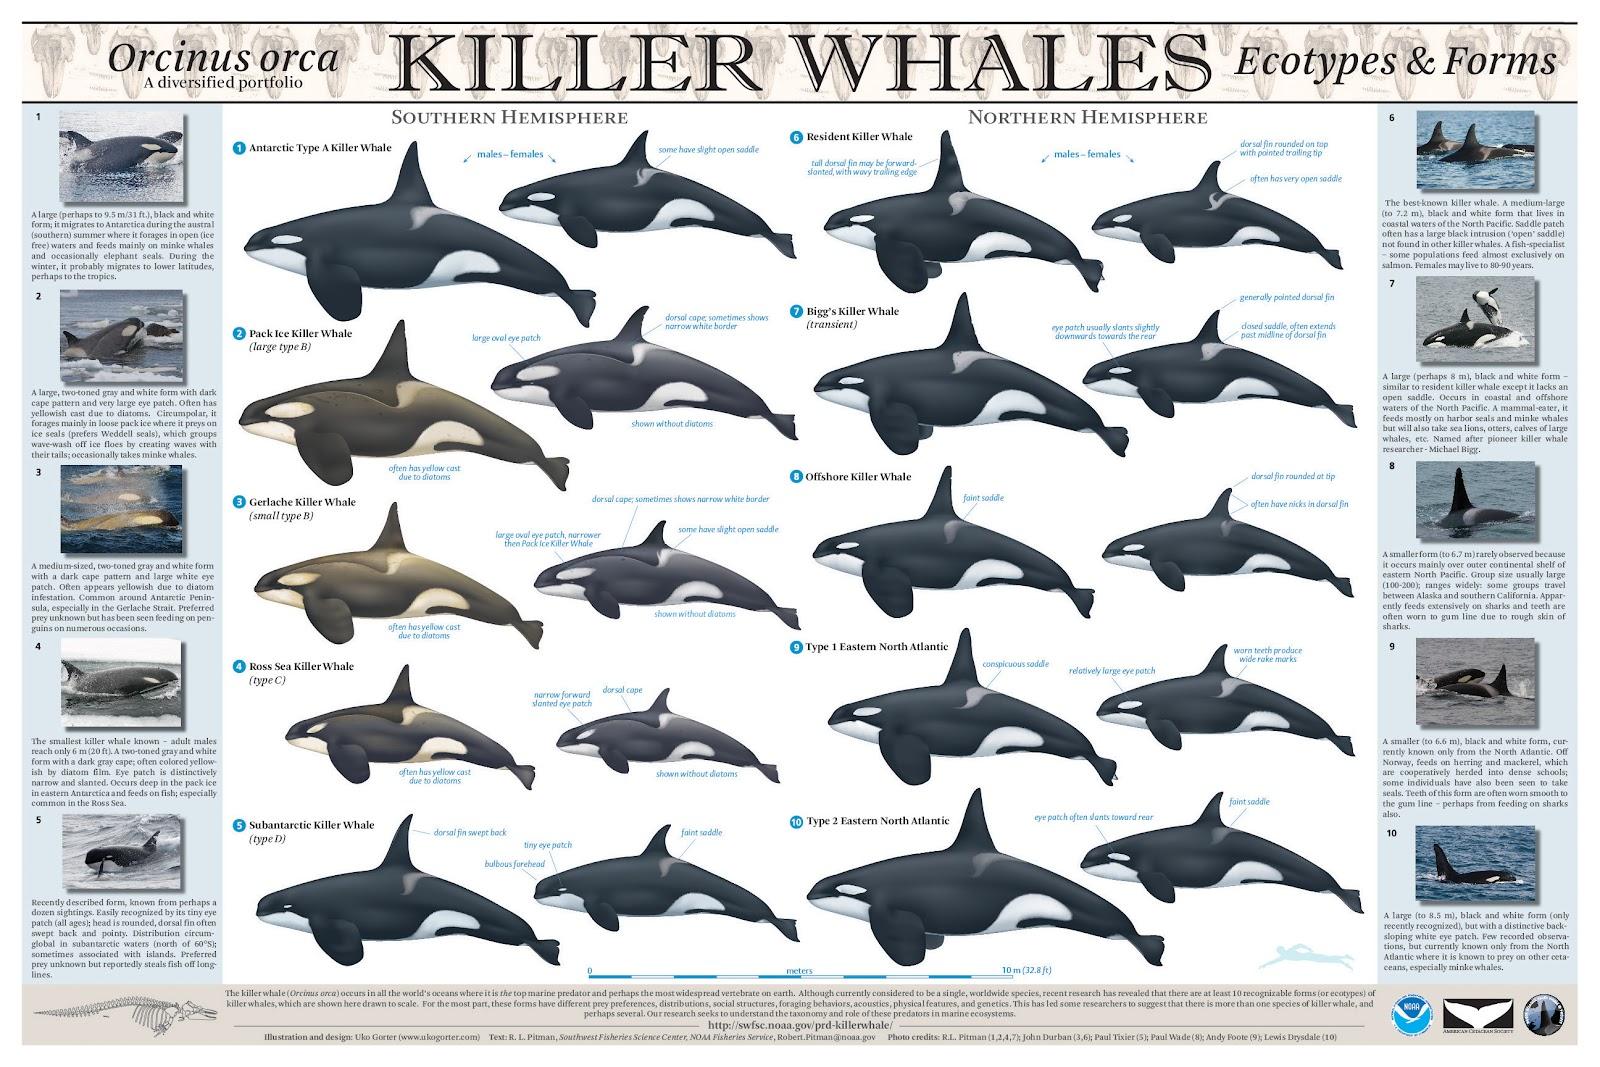 http://2.bp.blogspot.com/-0eLPbnCE-oM/UC0nh0B7UNI/AAAAAAAAADY/Jacb6Z6VmyA/s1600/Killer+Whale+Poster+(Credit+Uko+Gorter+&+Robert+Pitman+(SWFSC+NOAA)).jpg